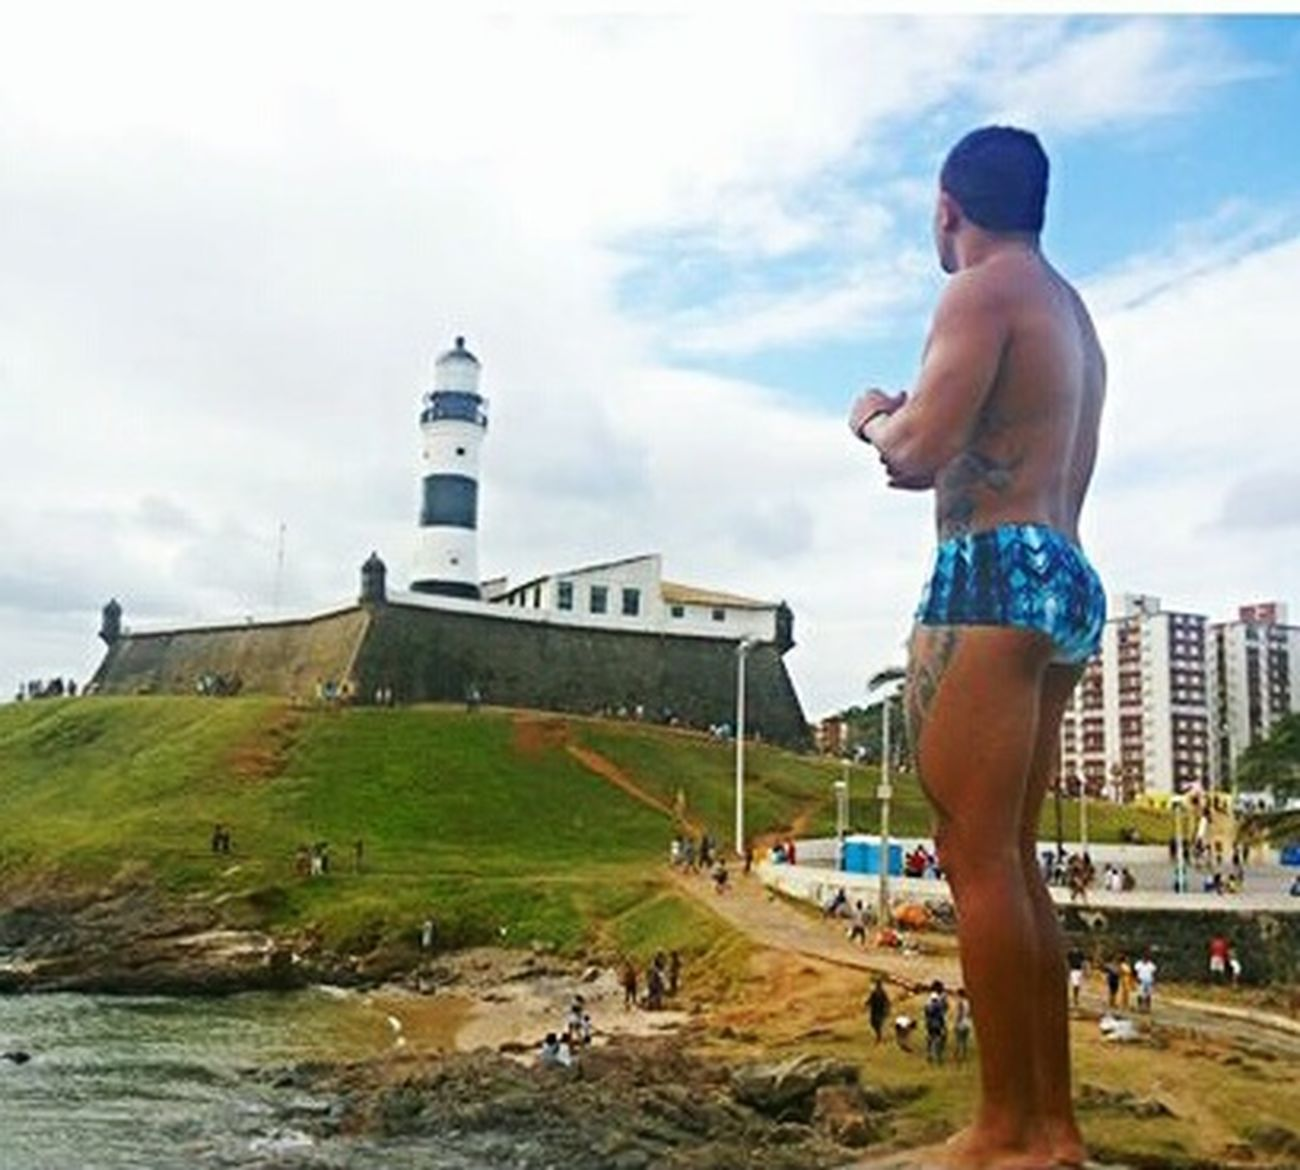 Bahia terra da Magia. Relaxing First Eyeem Photo